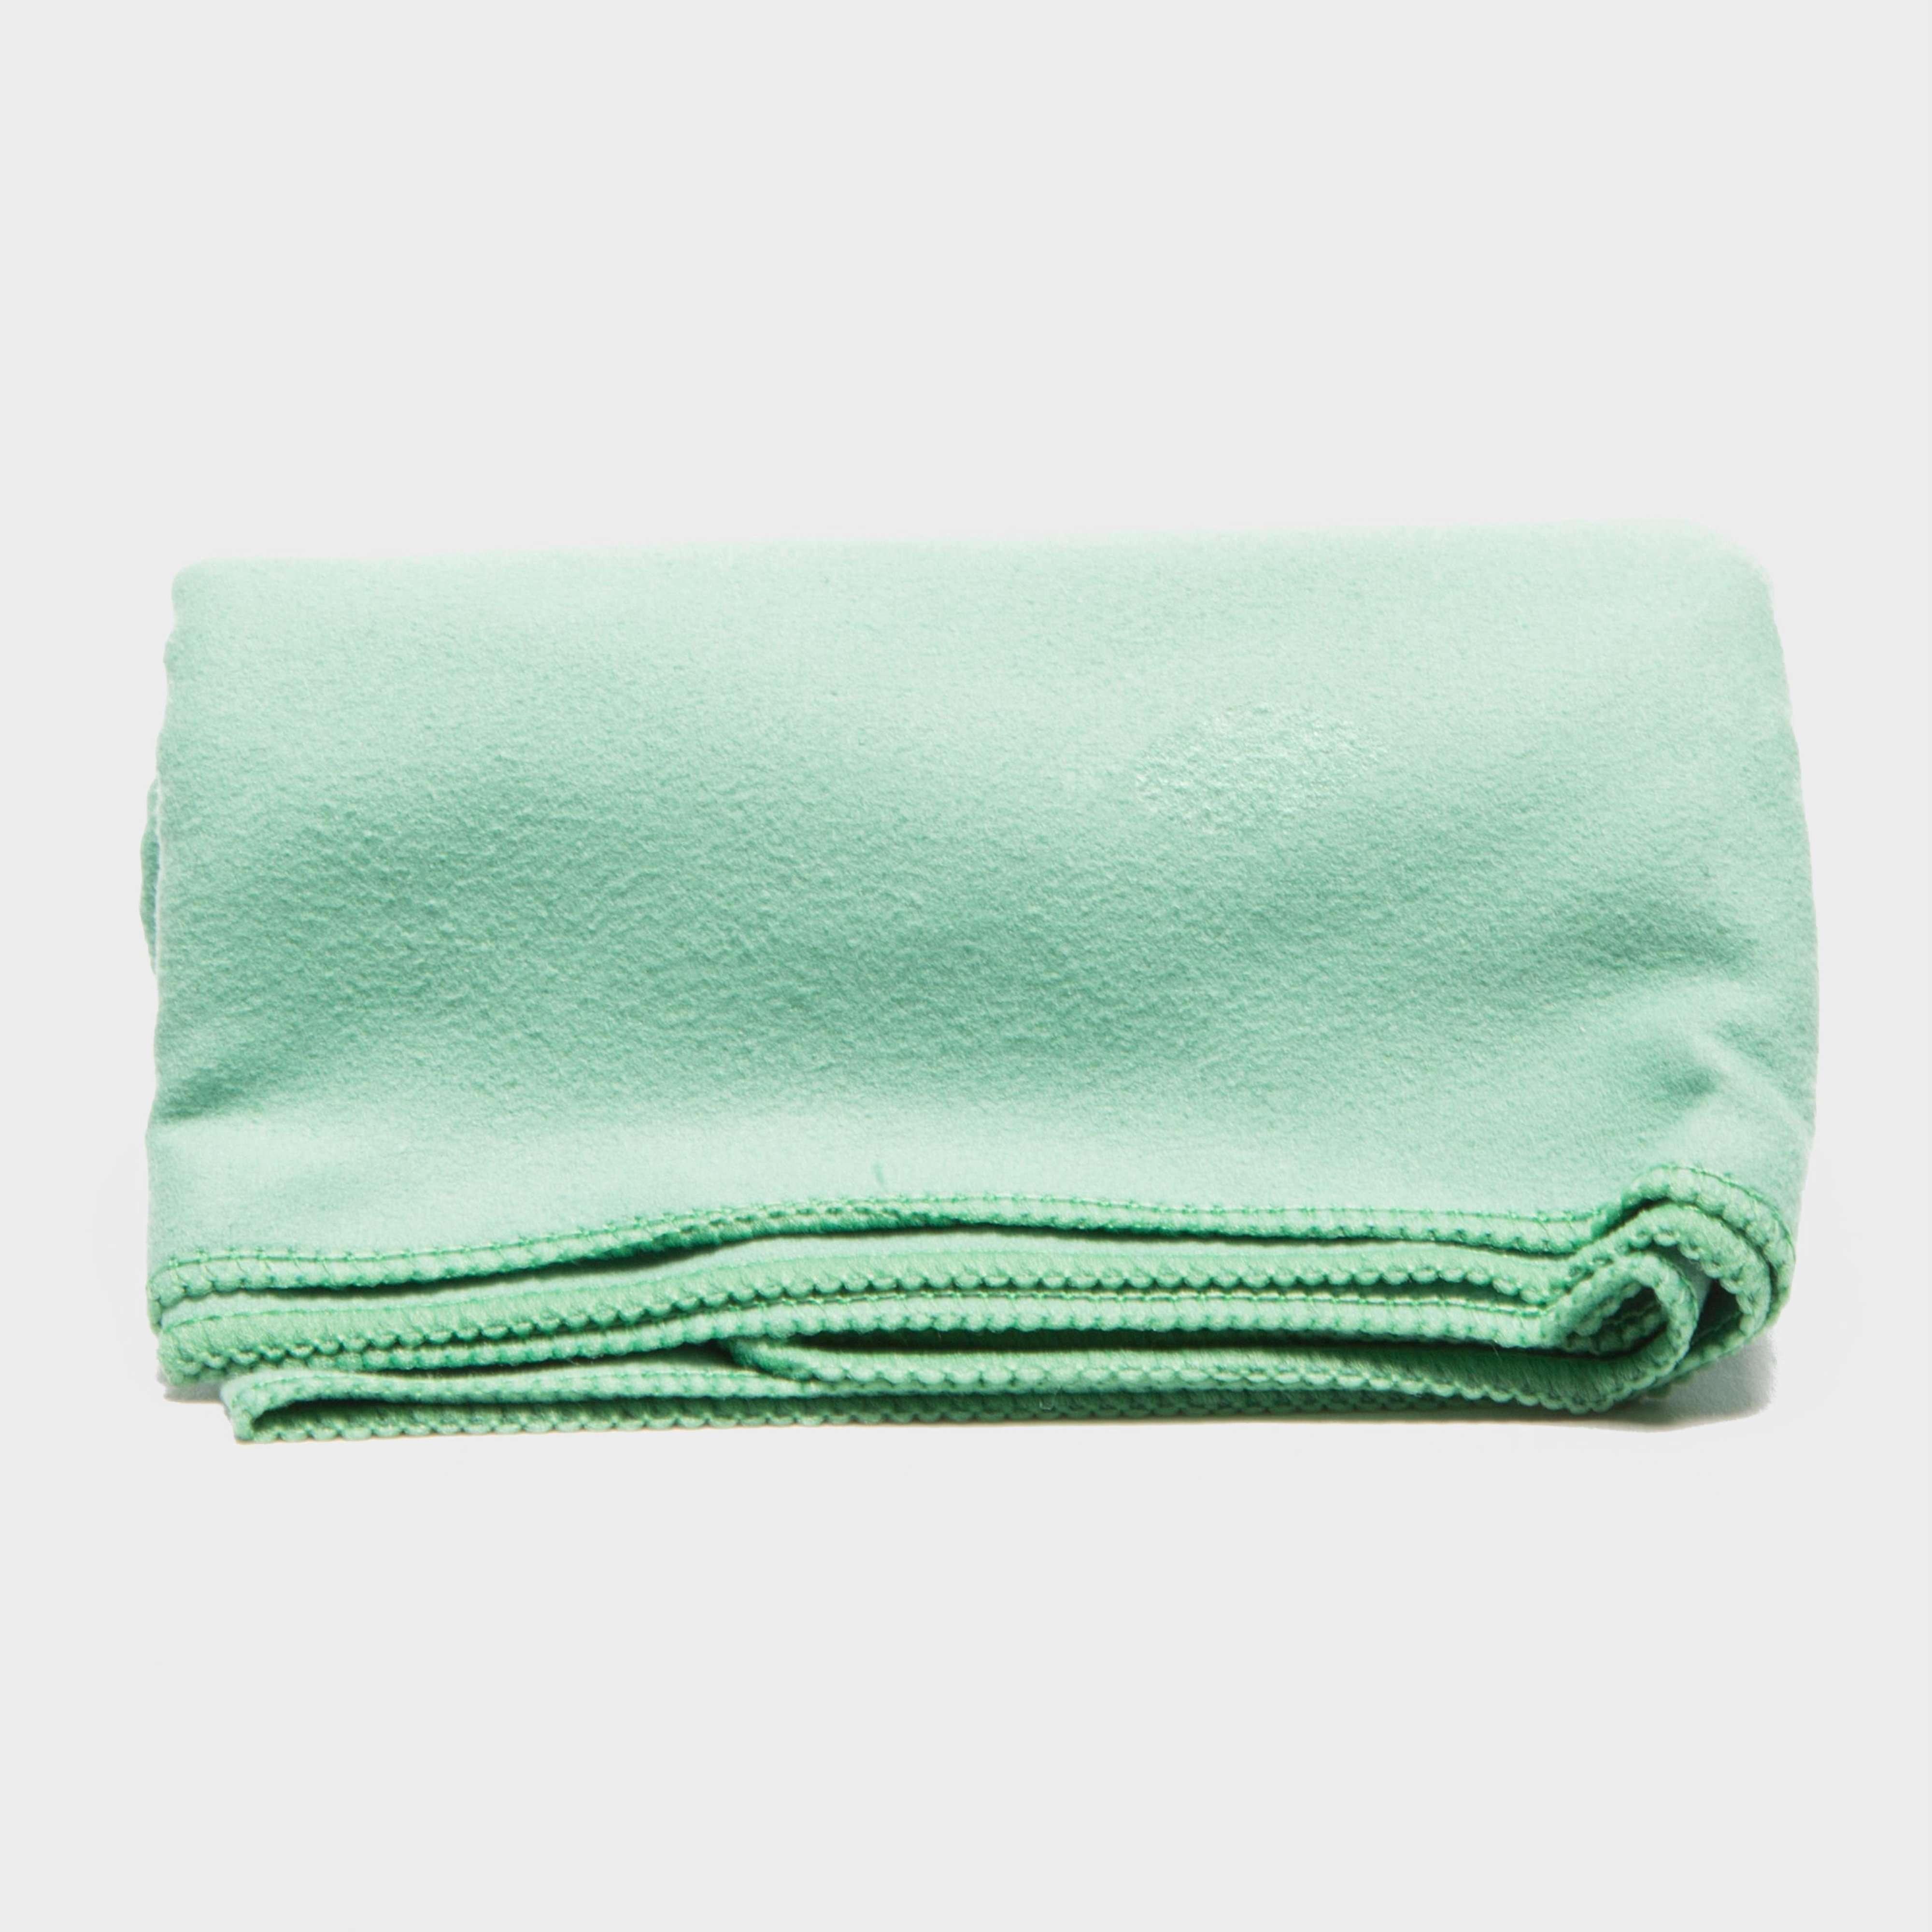 EUROHIKE Suede Microfibre Travel Towel - Small